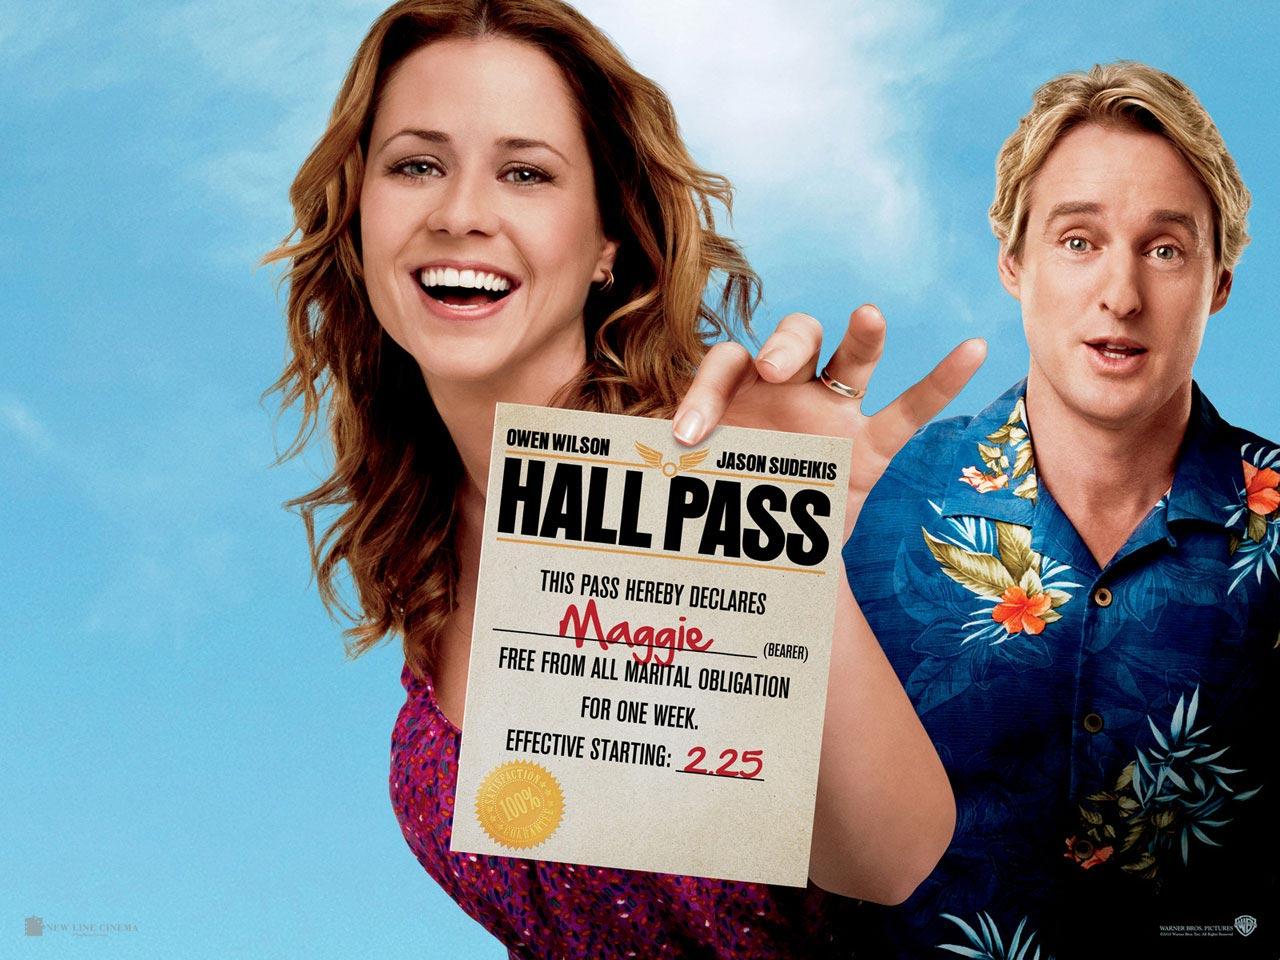 Hall Pass Red Band Trailer - FilmoFilia